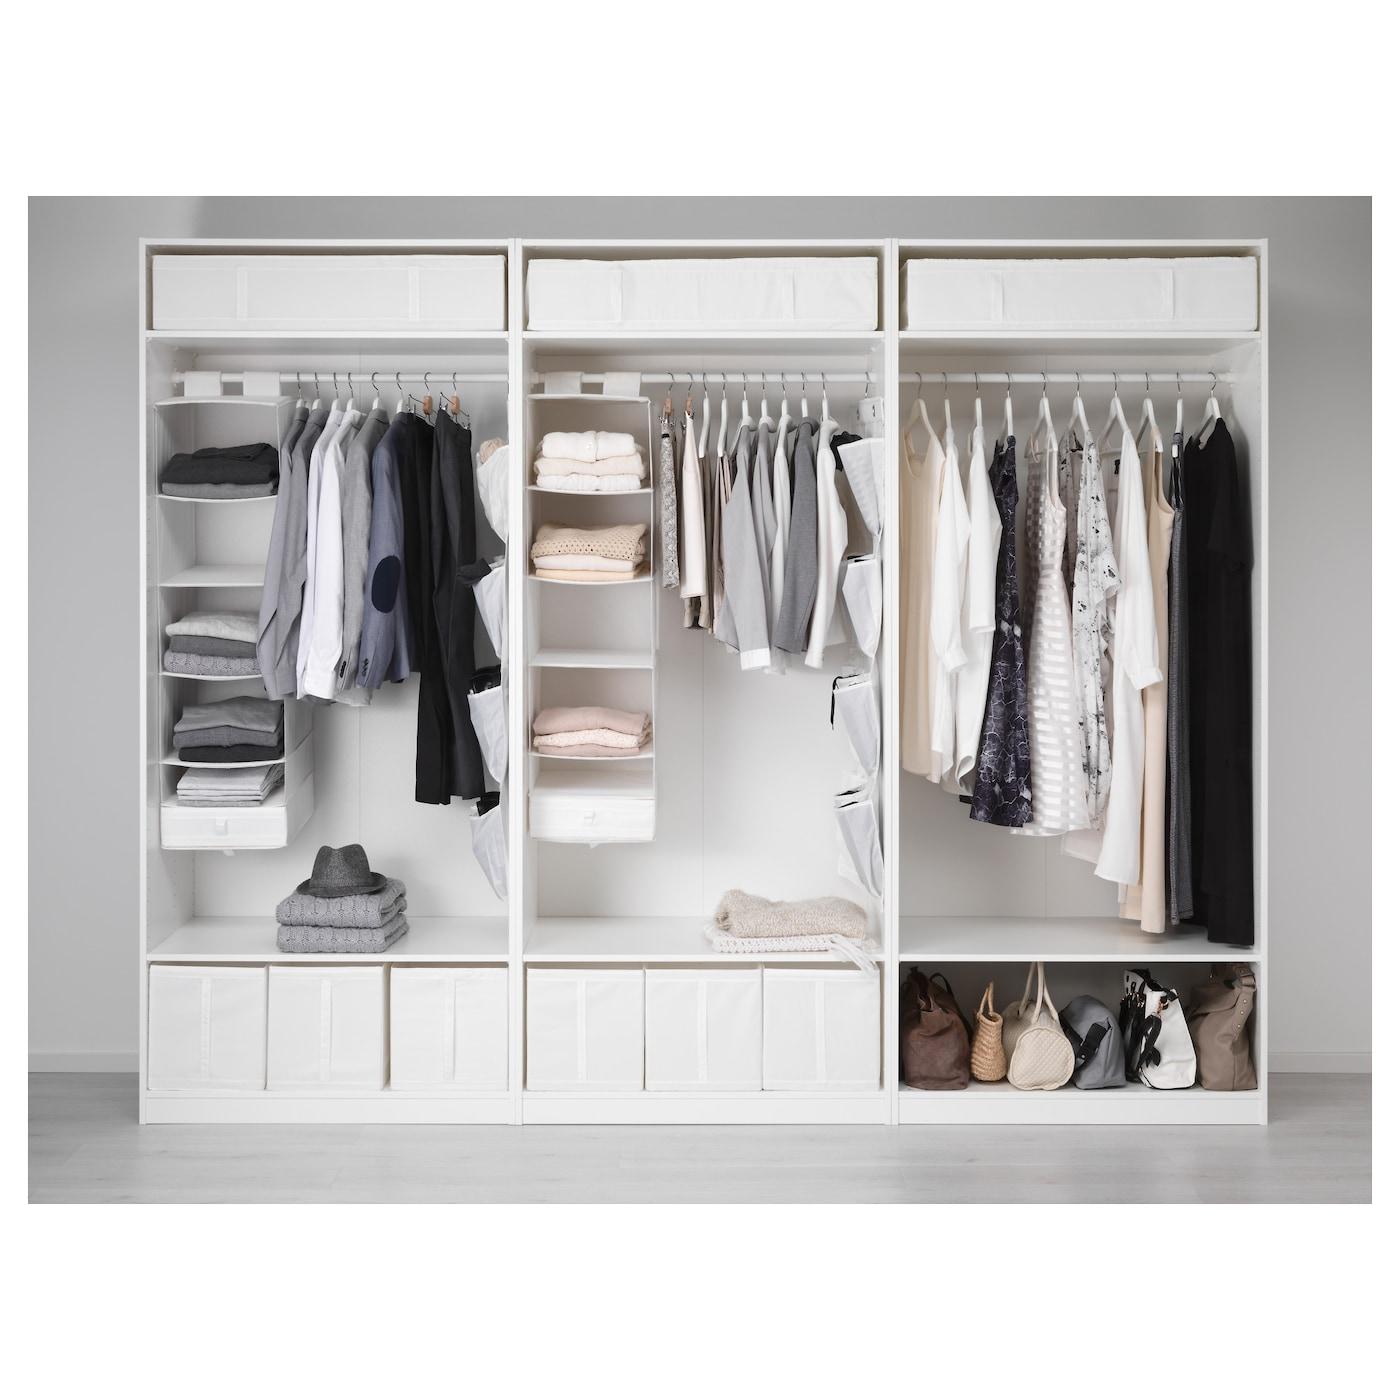 Kleiderschrank ikea pax  PAX Wardrobe White/bergsbo vikedal 300x60x236 cm - IKEA